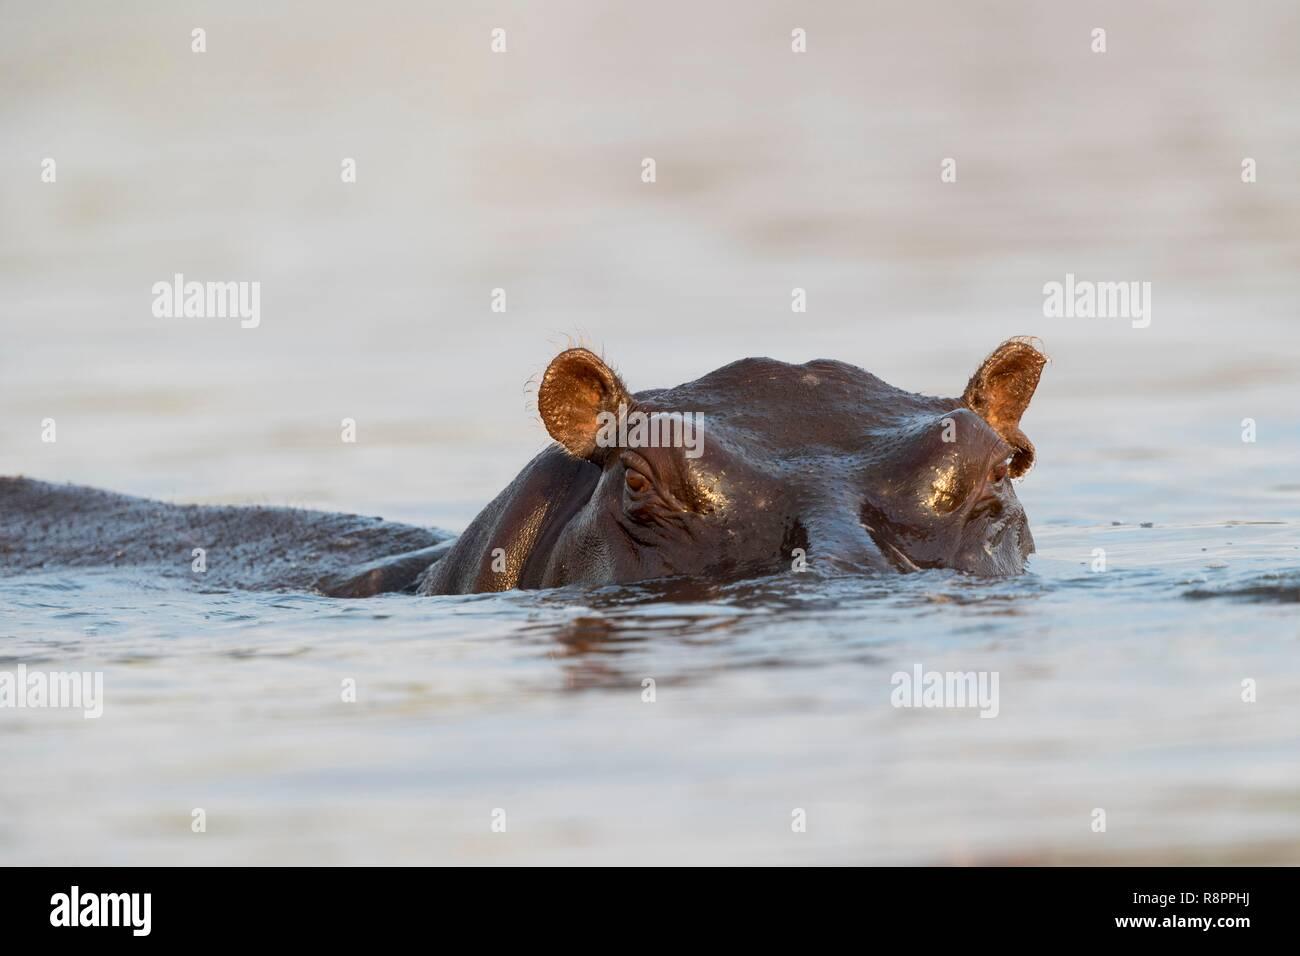 Bostwana, Chobe National Park, Chobe river, Common hippopotamus or Hippo (Hippopotamus amphibius), in the water Stock Photo